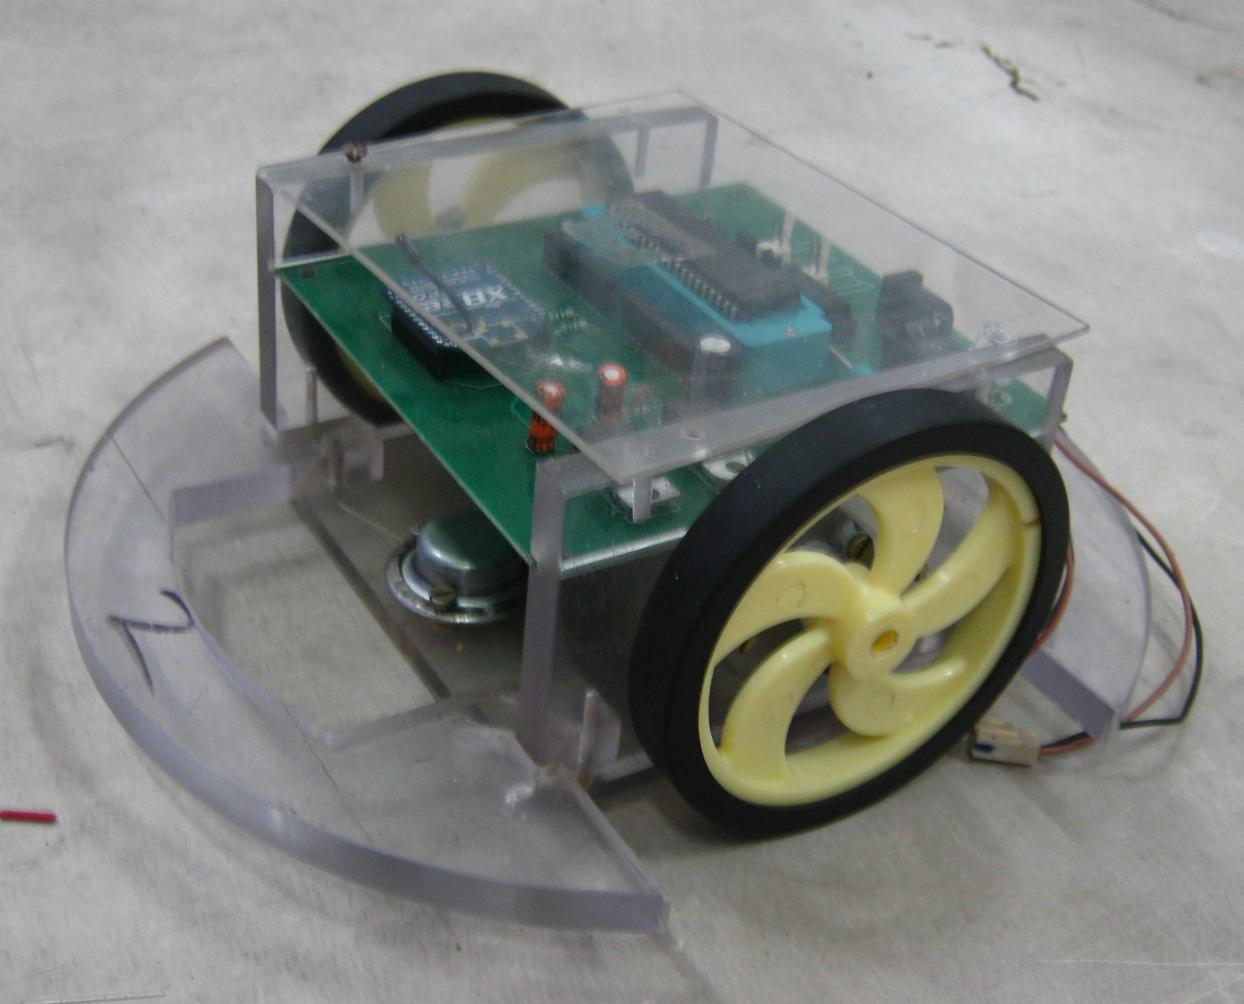 Indian Institute Of Technology Kanpur Robotic Platform Department